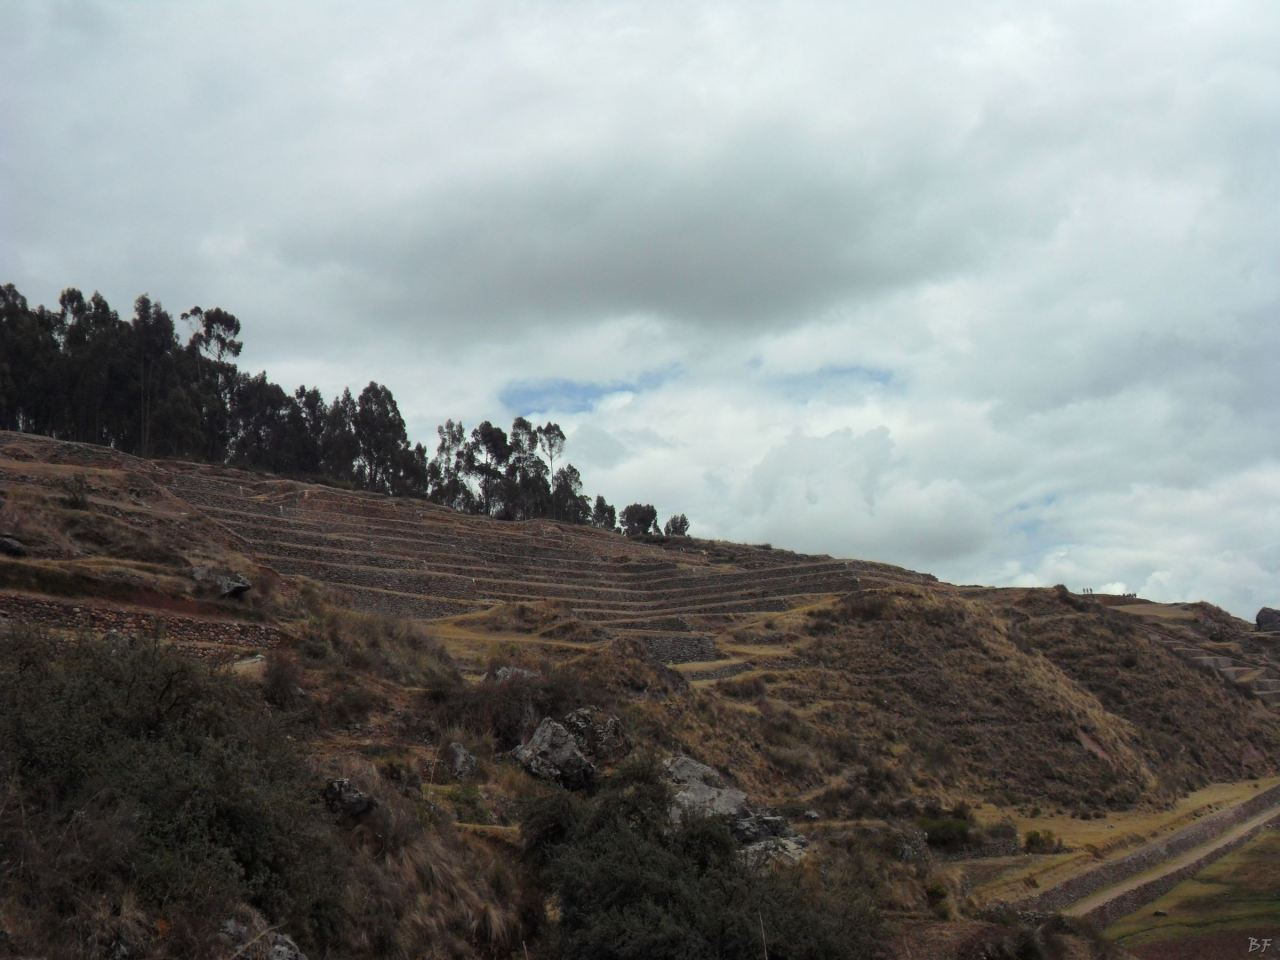 Chinchero-Mura-Poligonali-Piramide-Urubamba-Peru-71